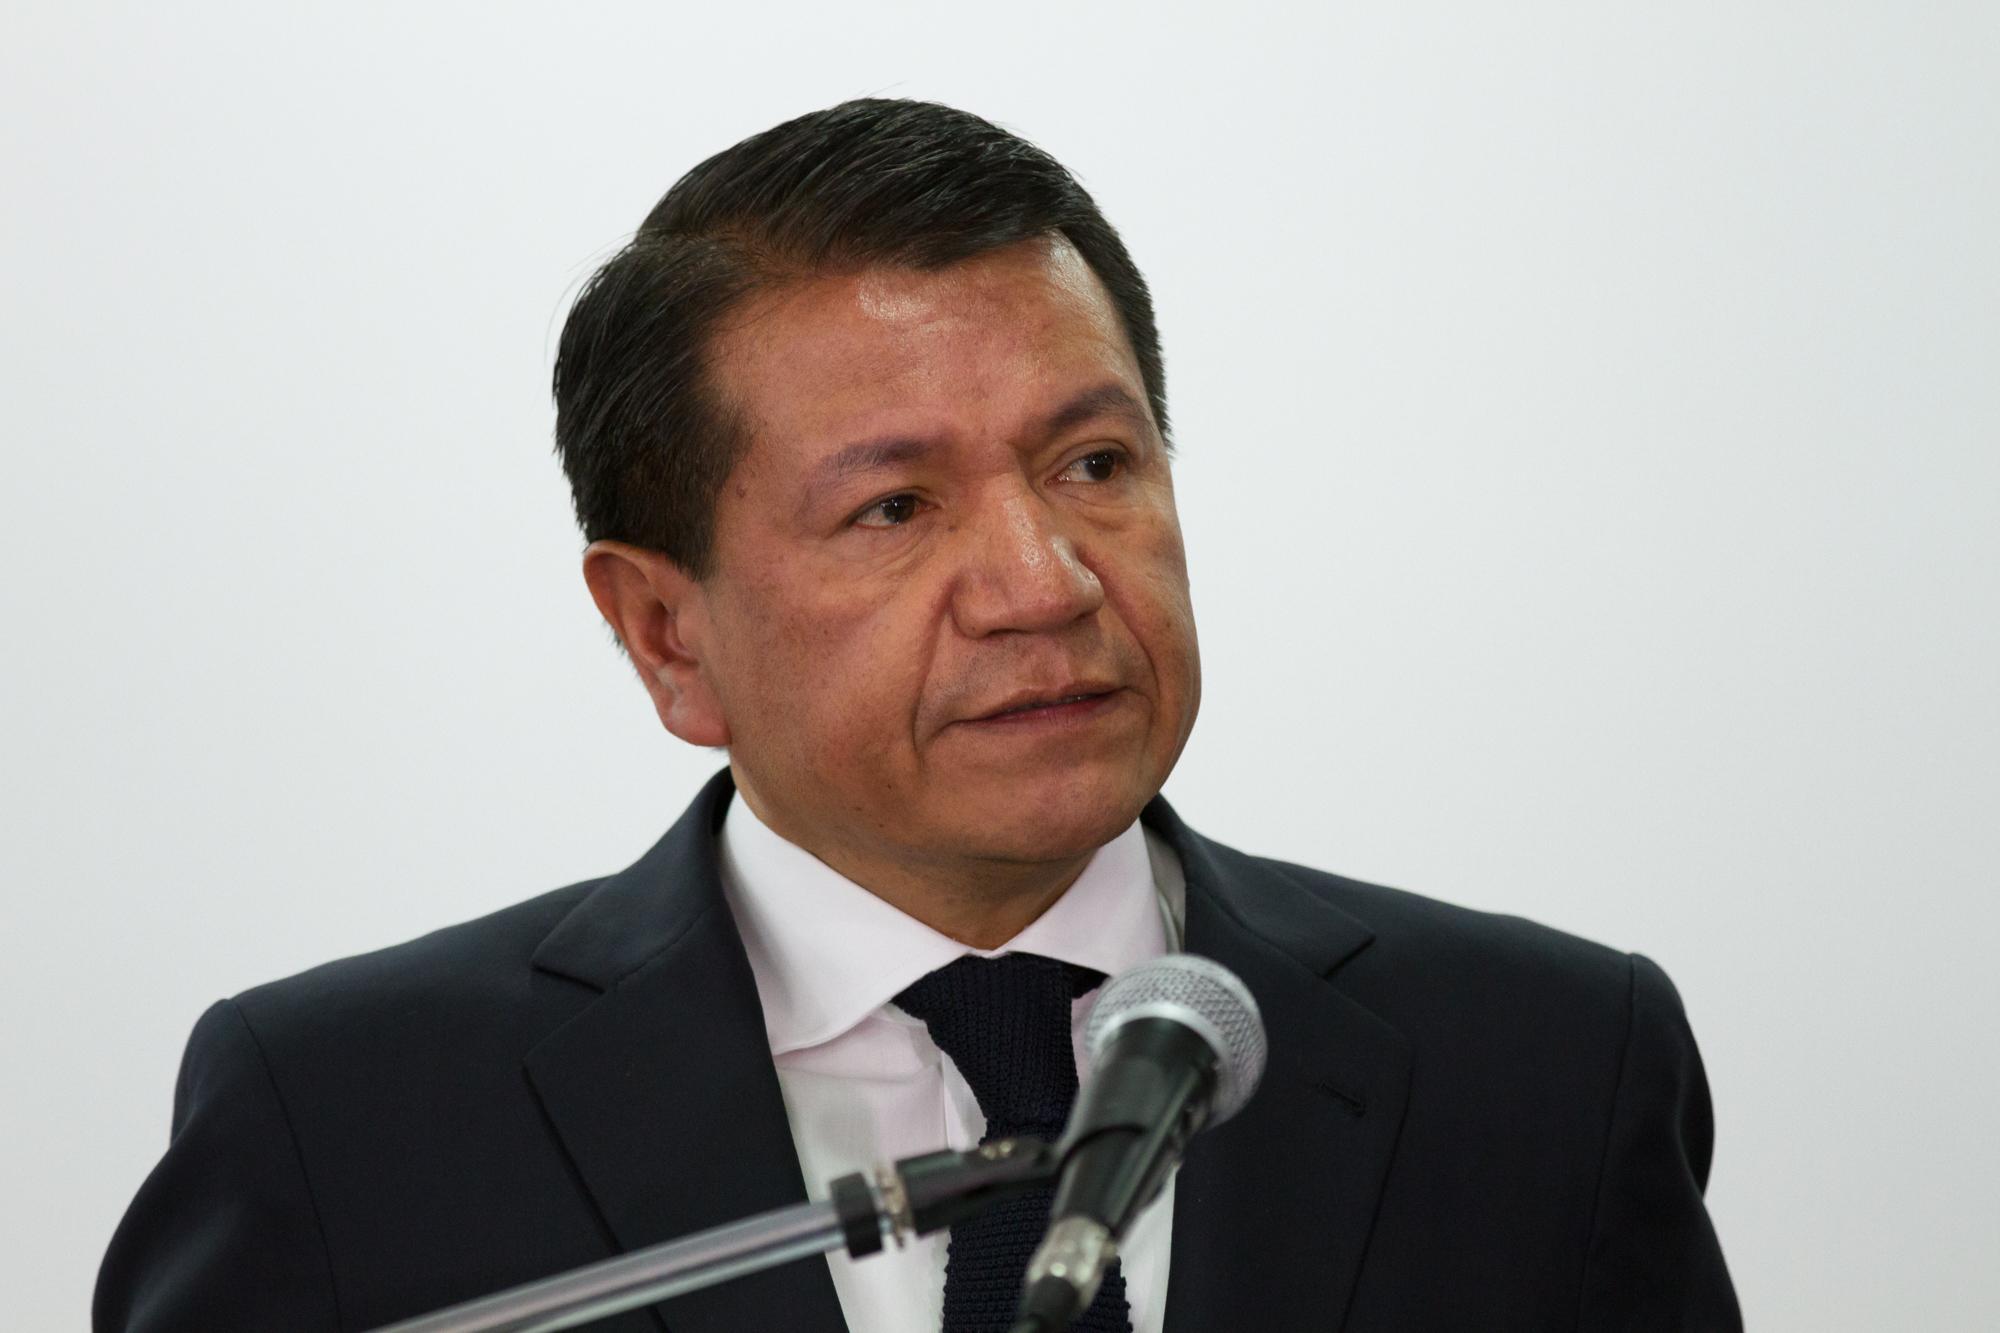 Jorge Armando Otálora oficializó su renuncia irrevocable